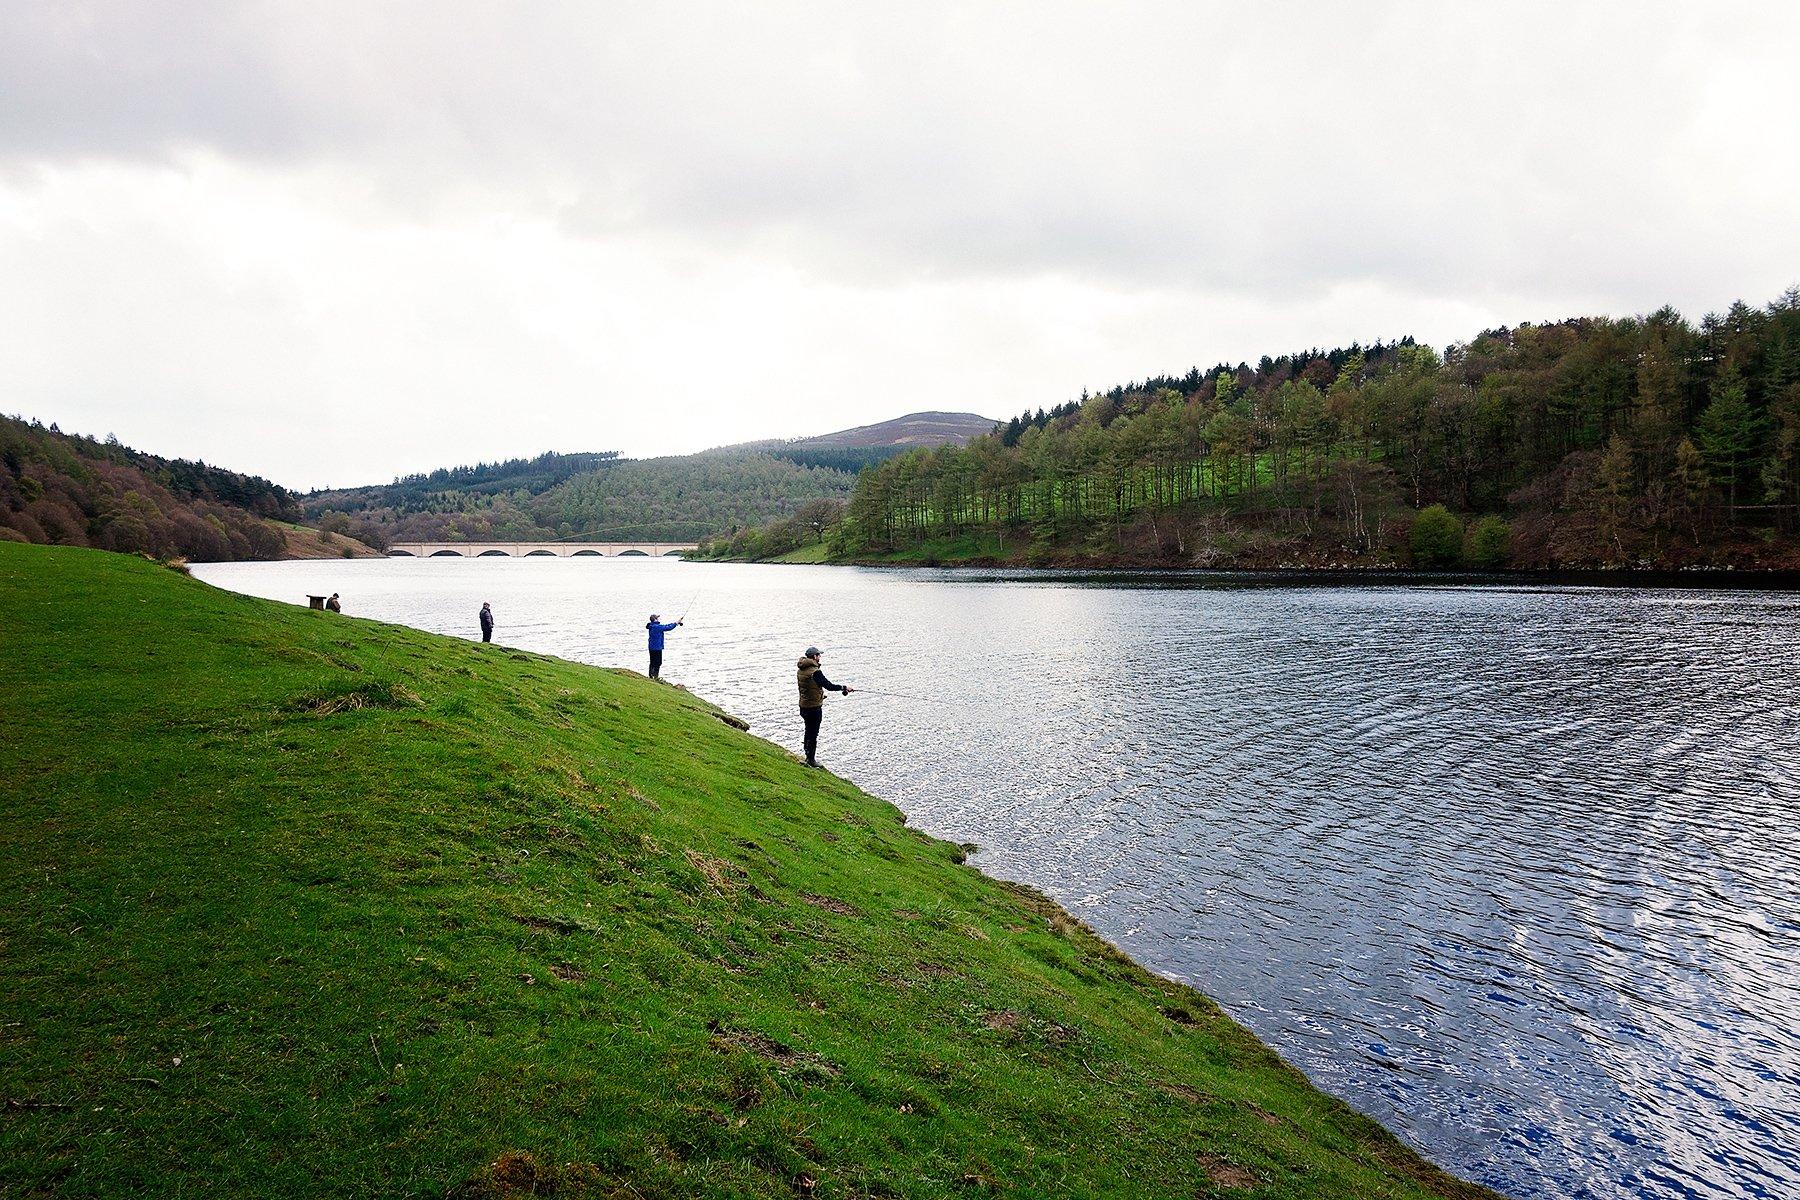 Fishing at Ladybower Reservoir